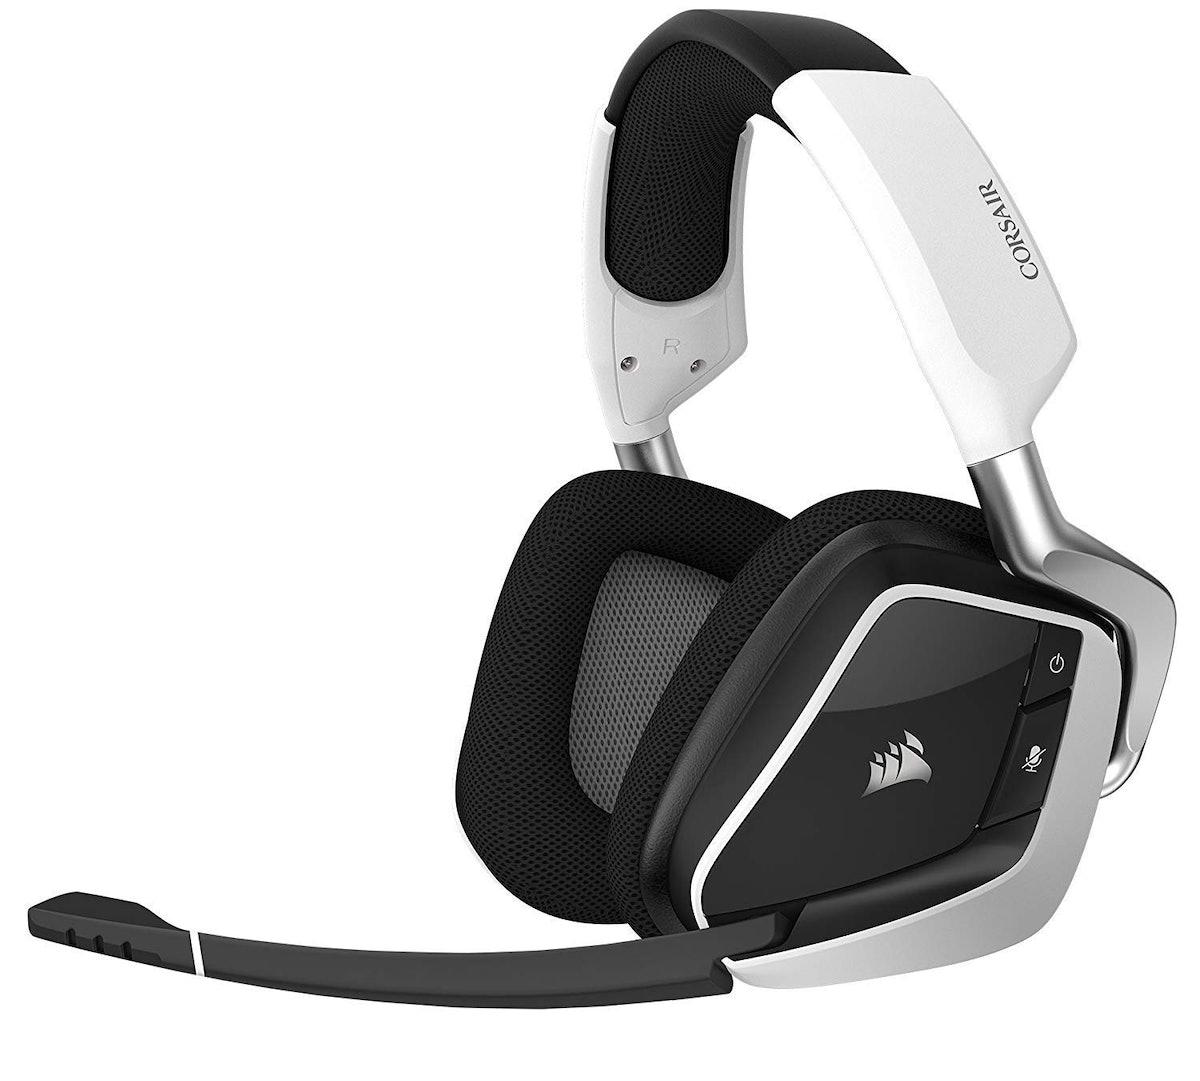 CORSAIR Void PRO RGB Wireless Headset